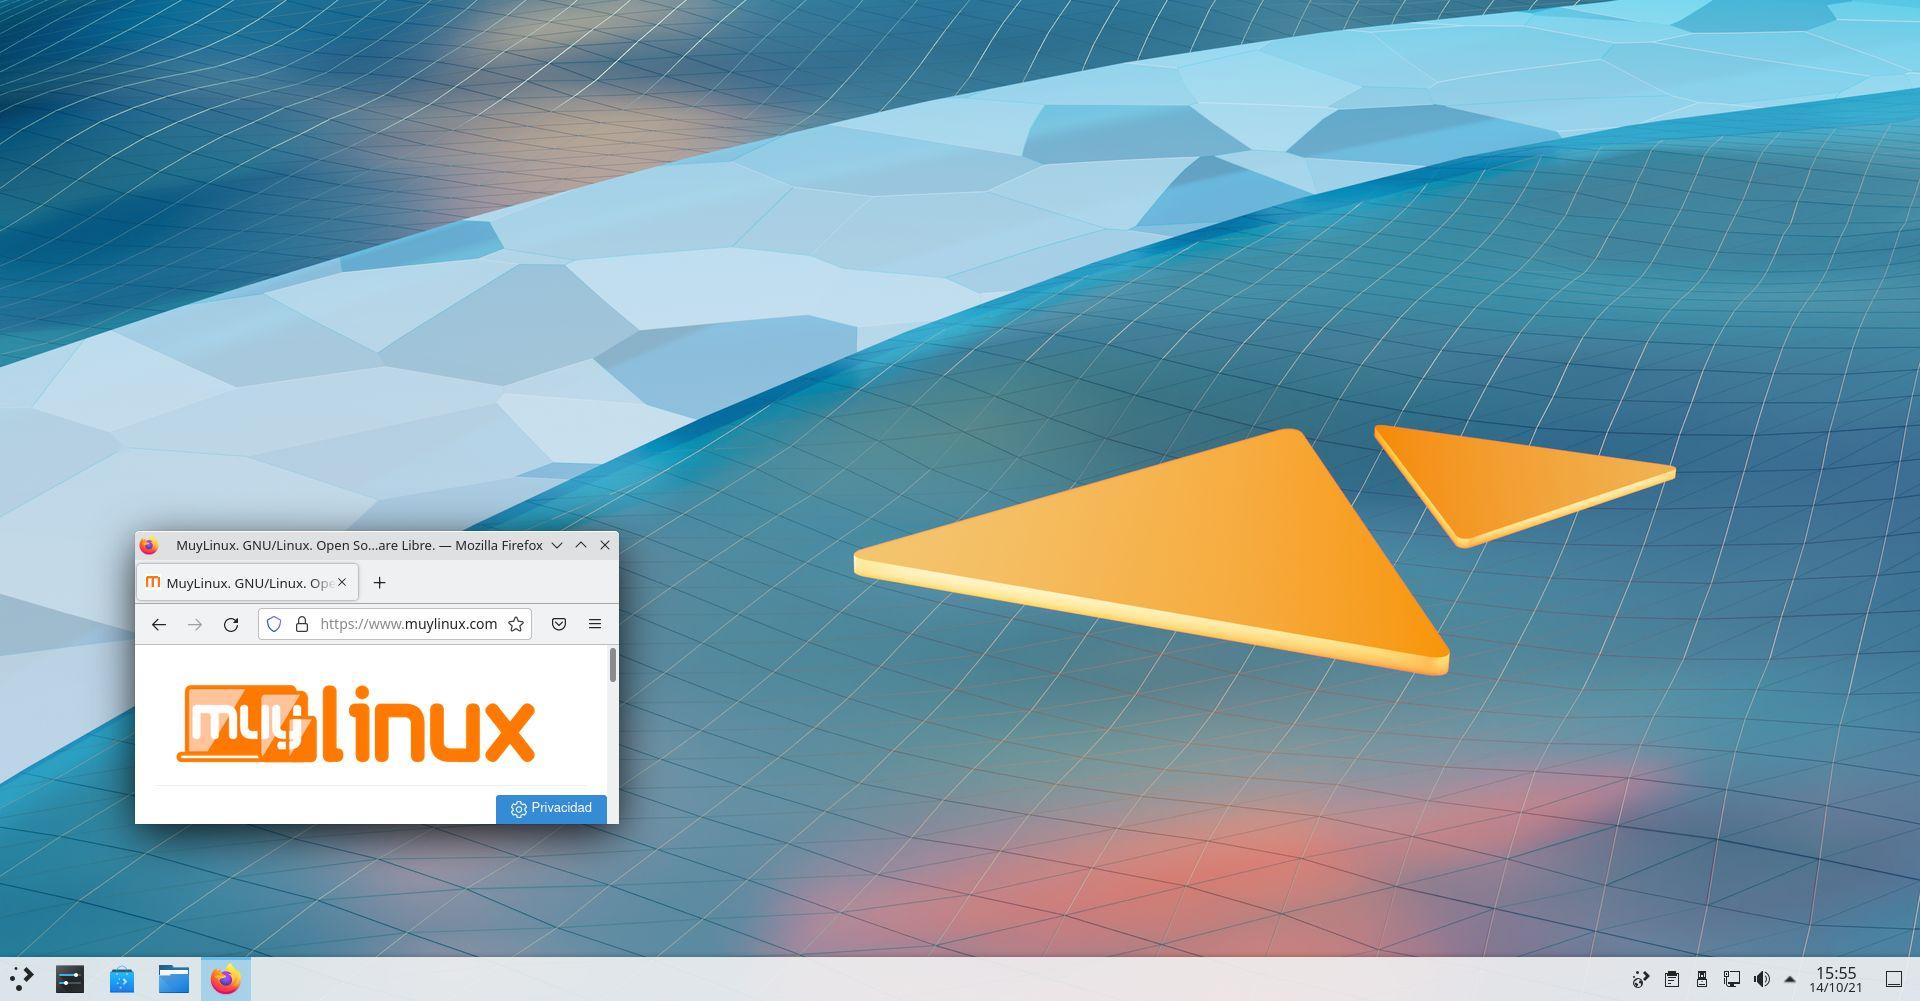 Vista general de KDE Plasma 5.23